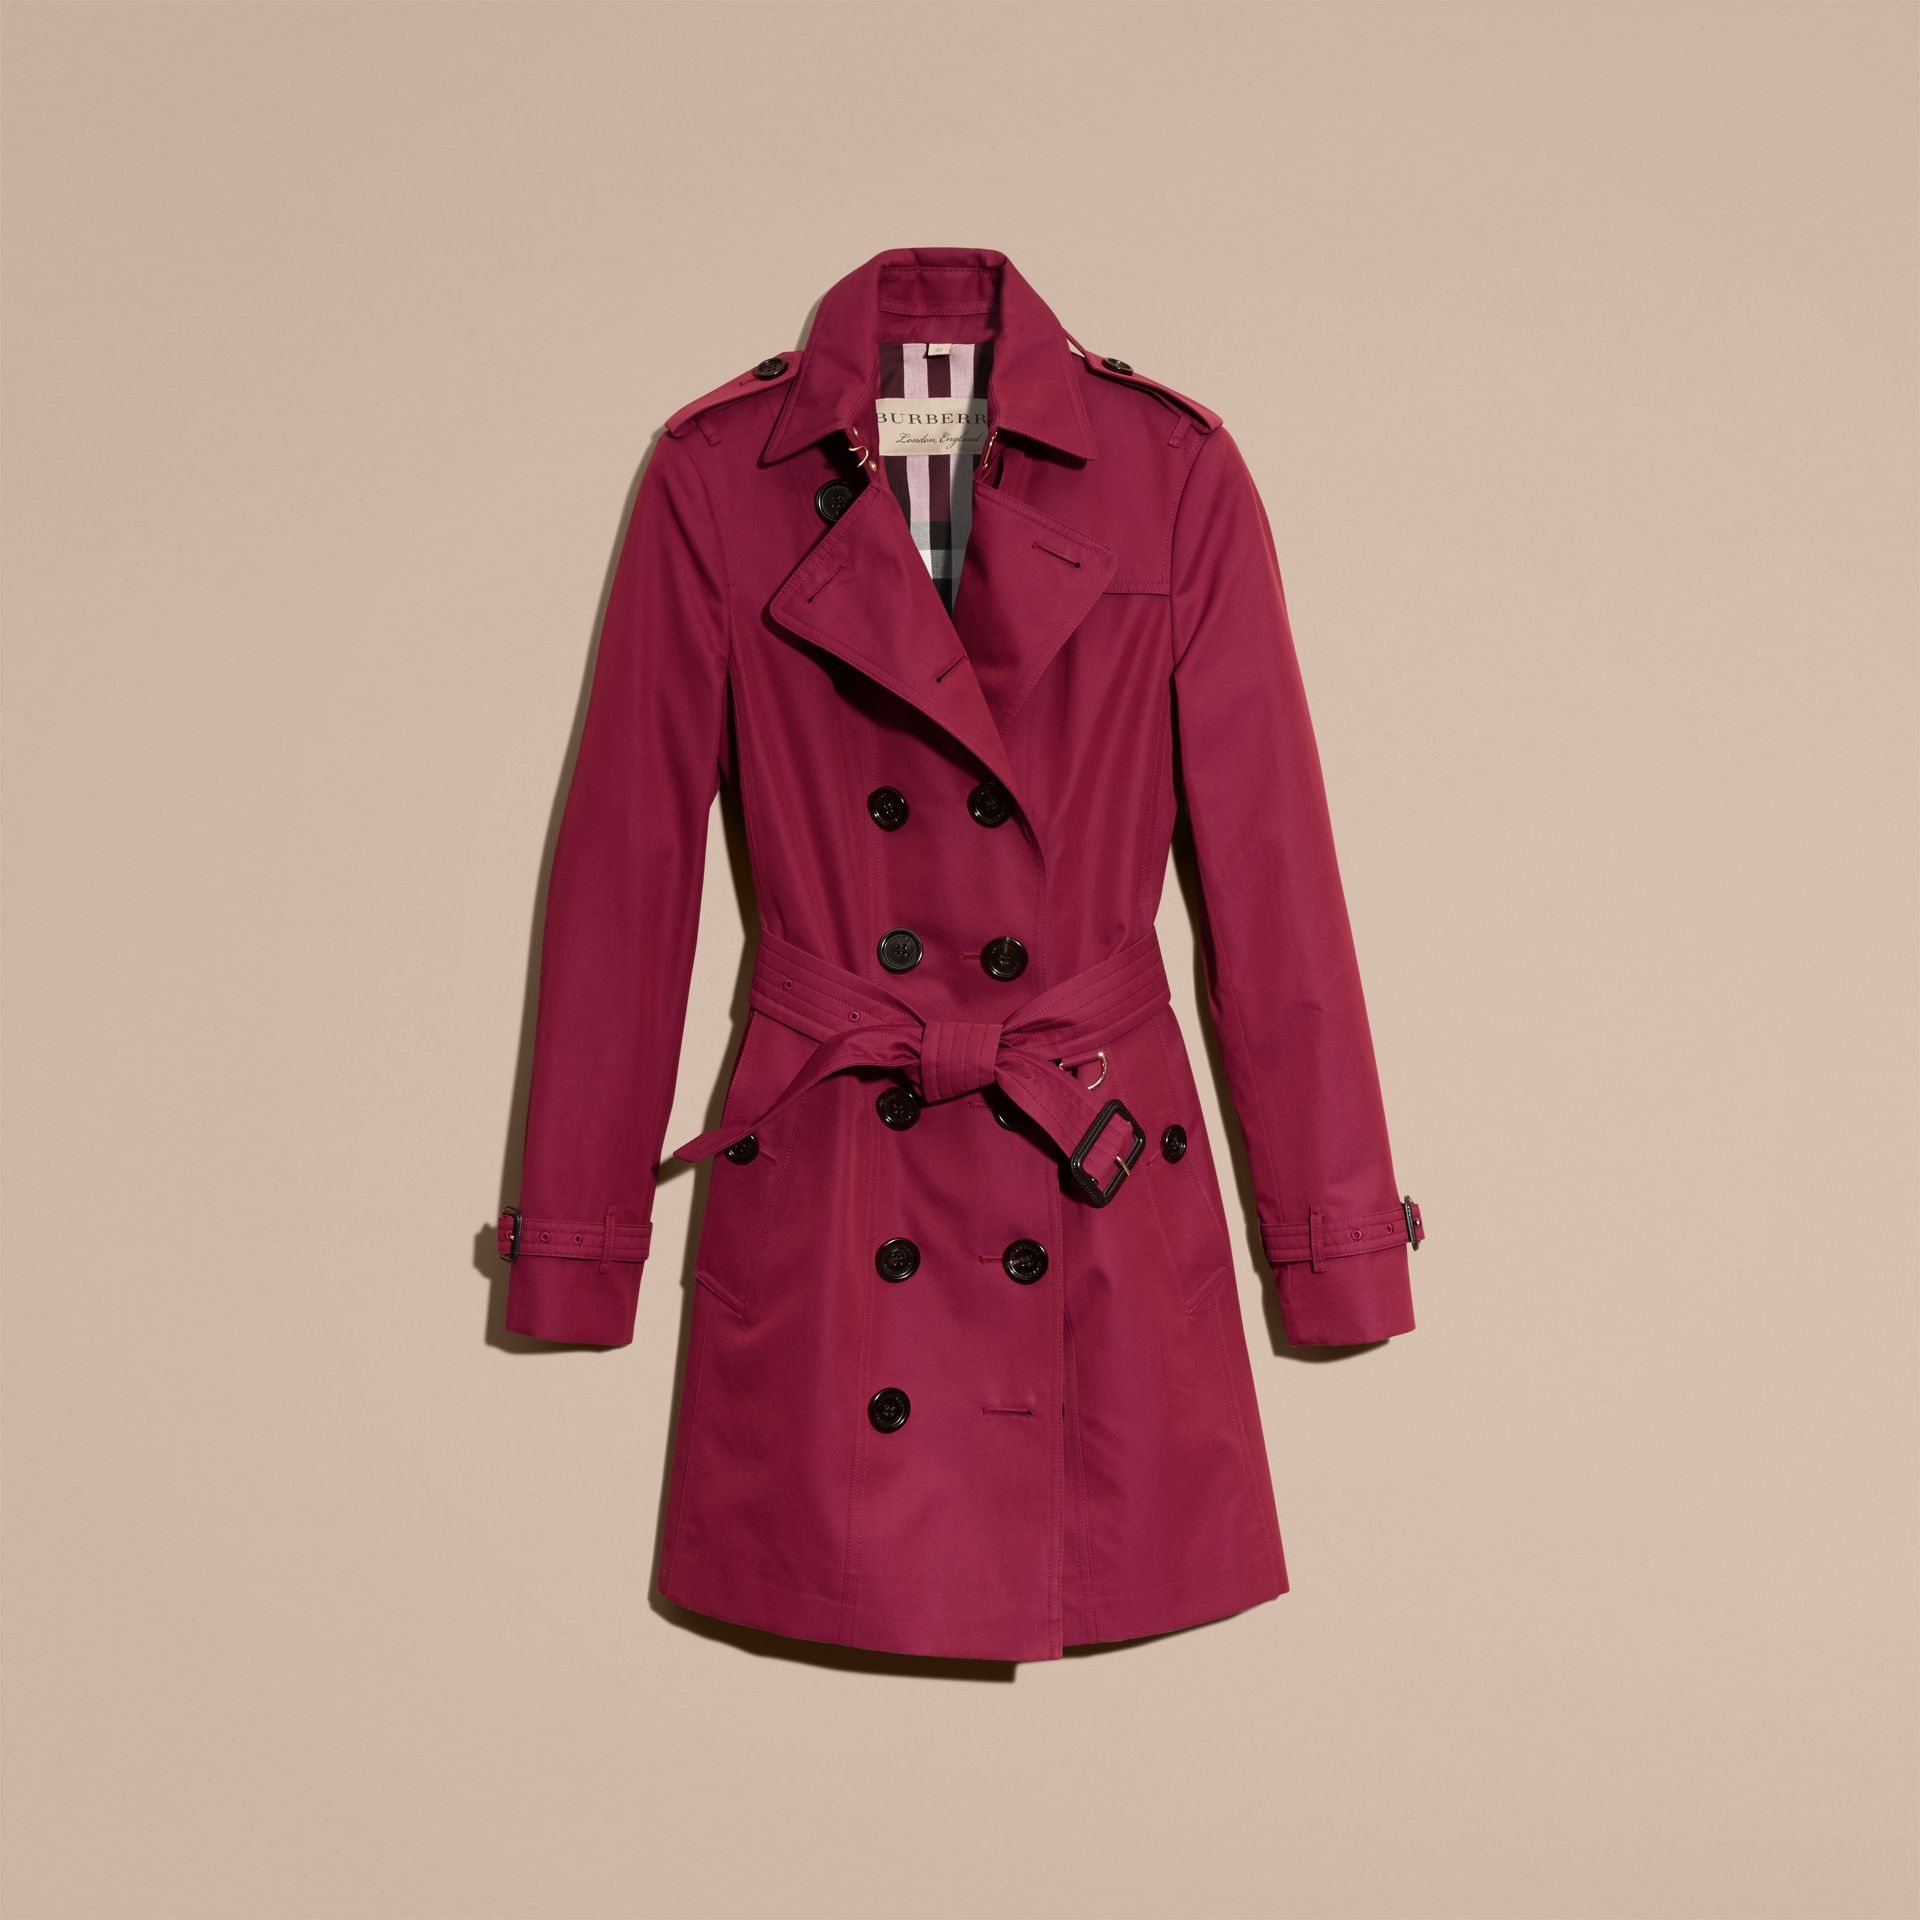 Damson pink Cotton Gabardine Trench Coat Damson Pink - gallery image 4